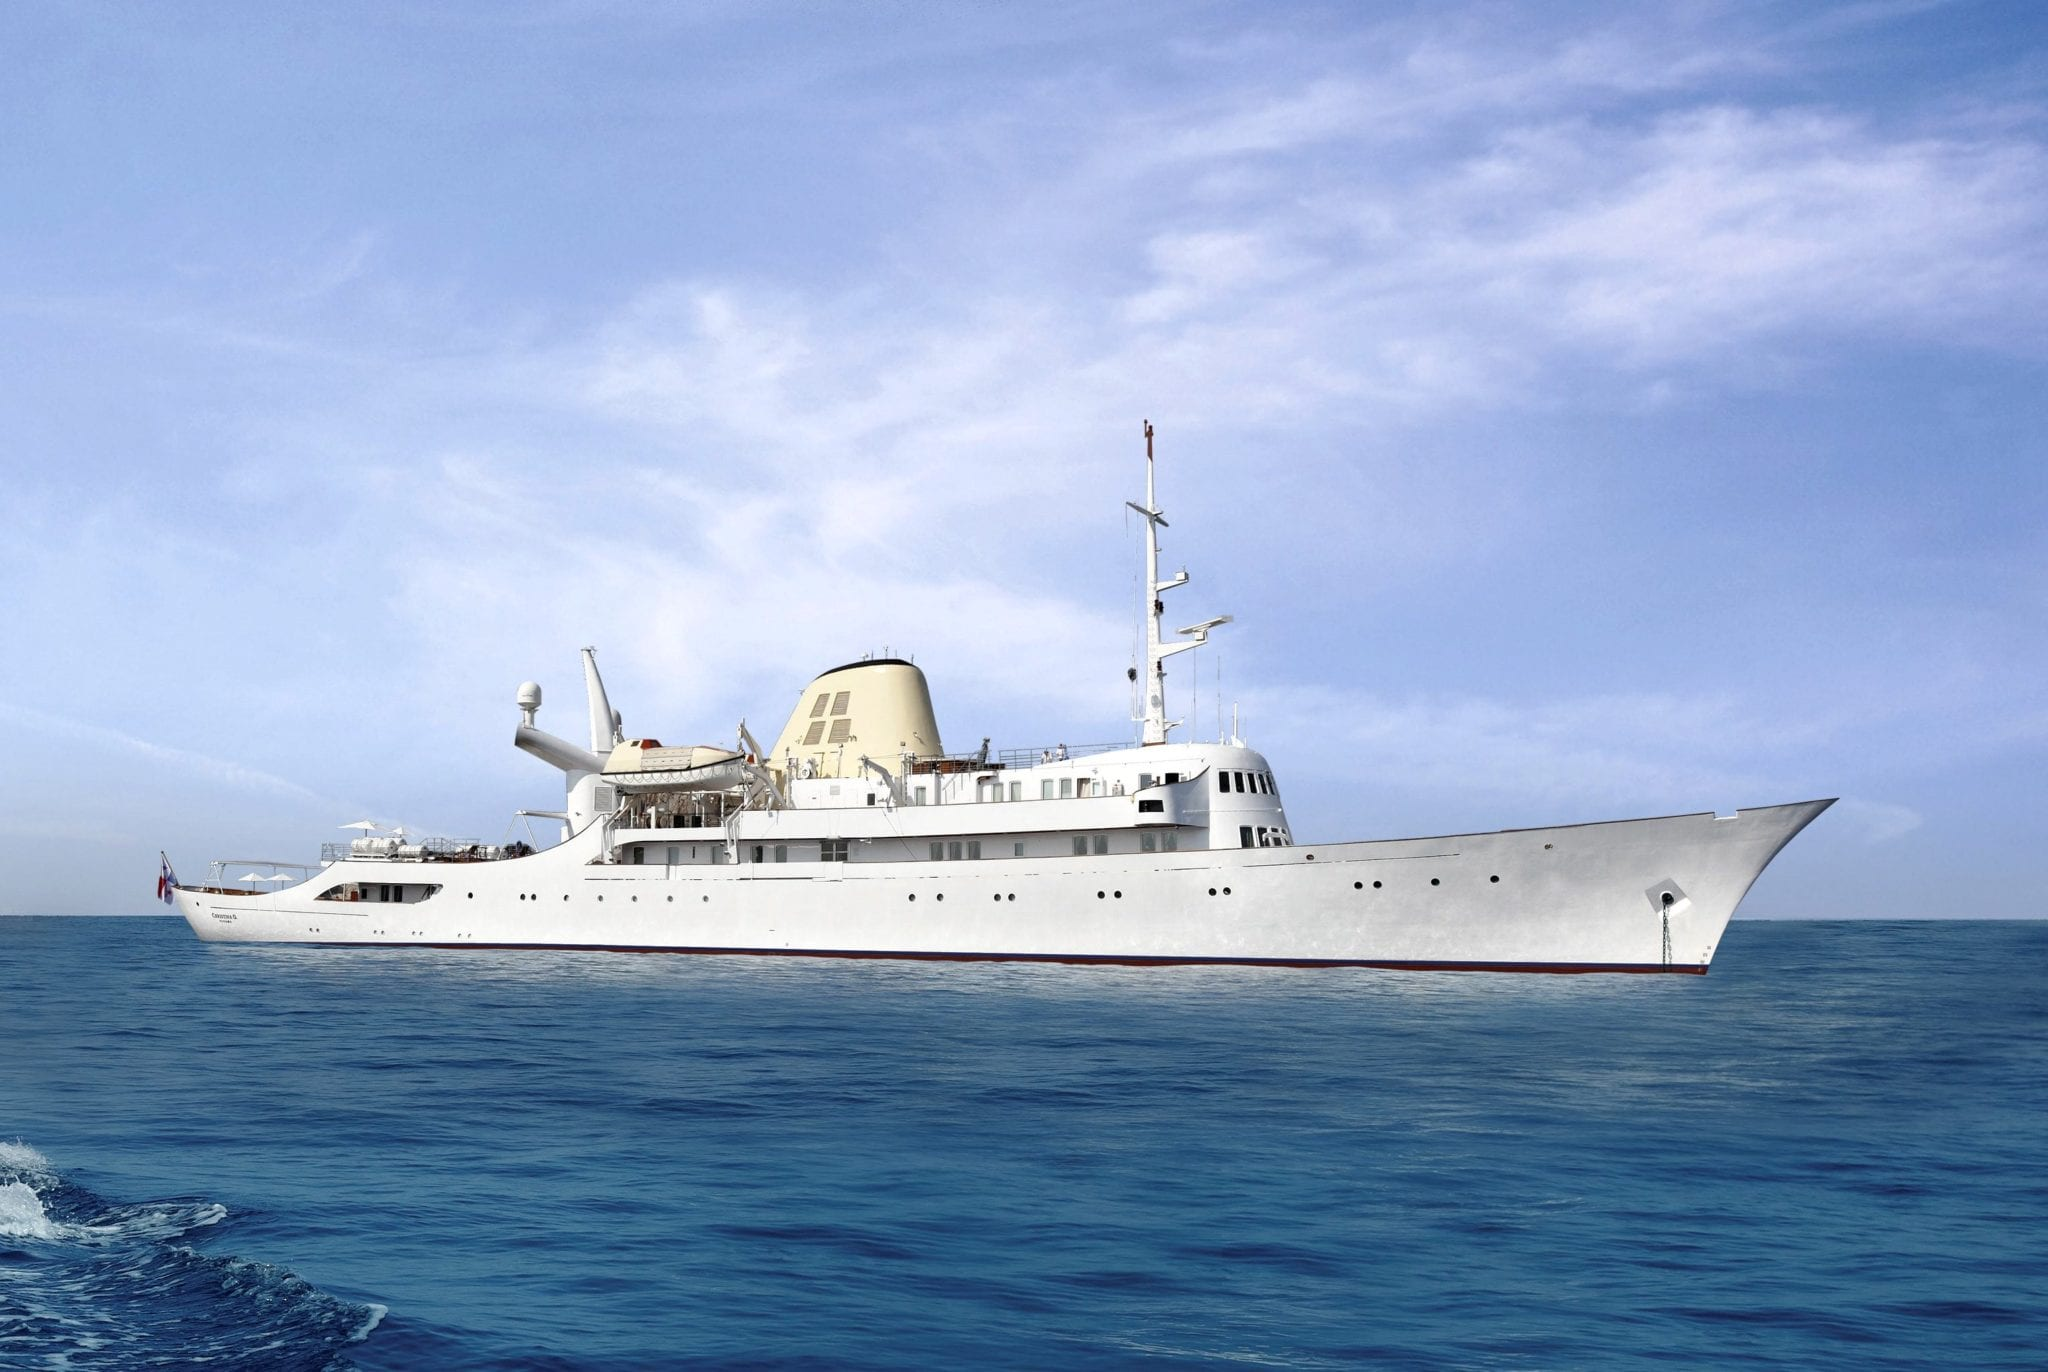 christina o superyacht onassis valef yachts -  Valef Yachts Chartering - 3643